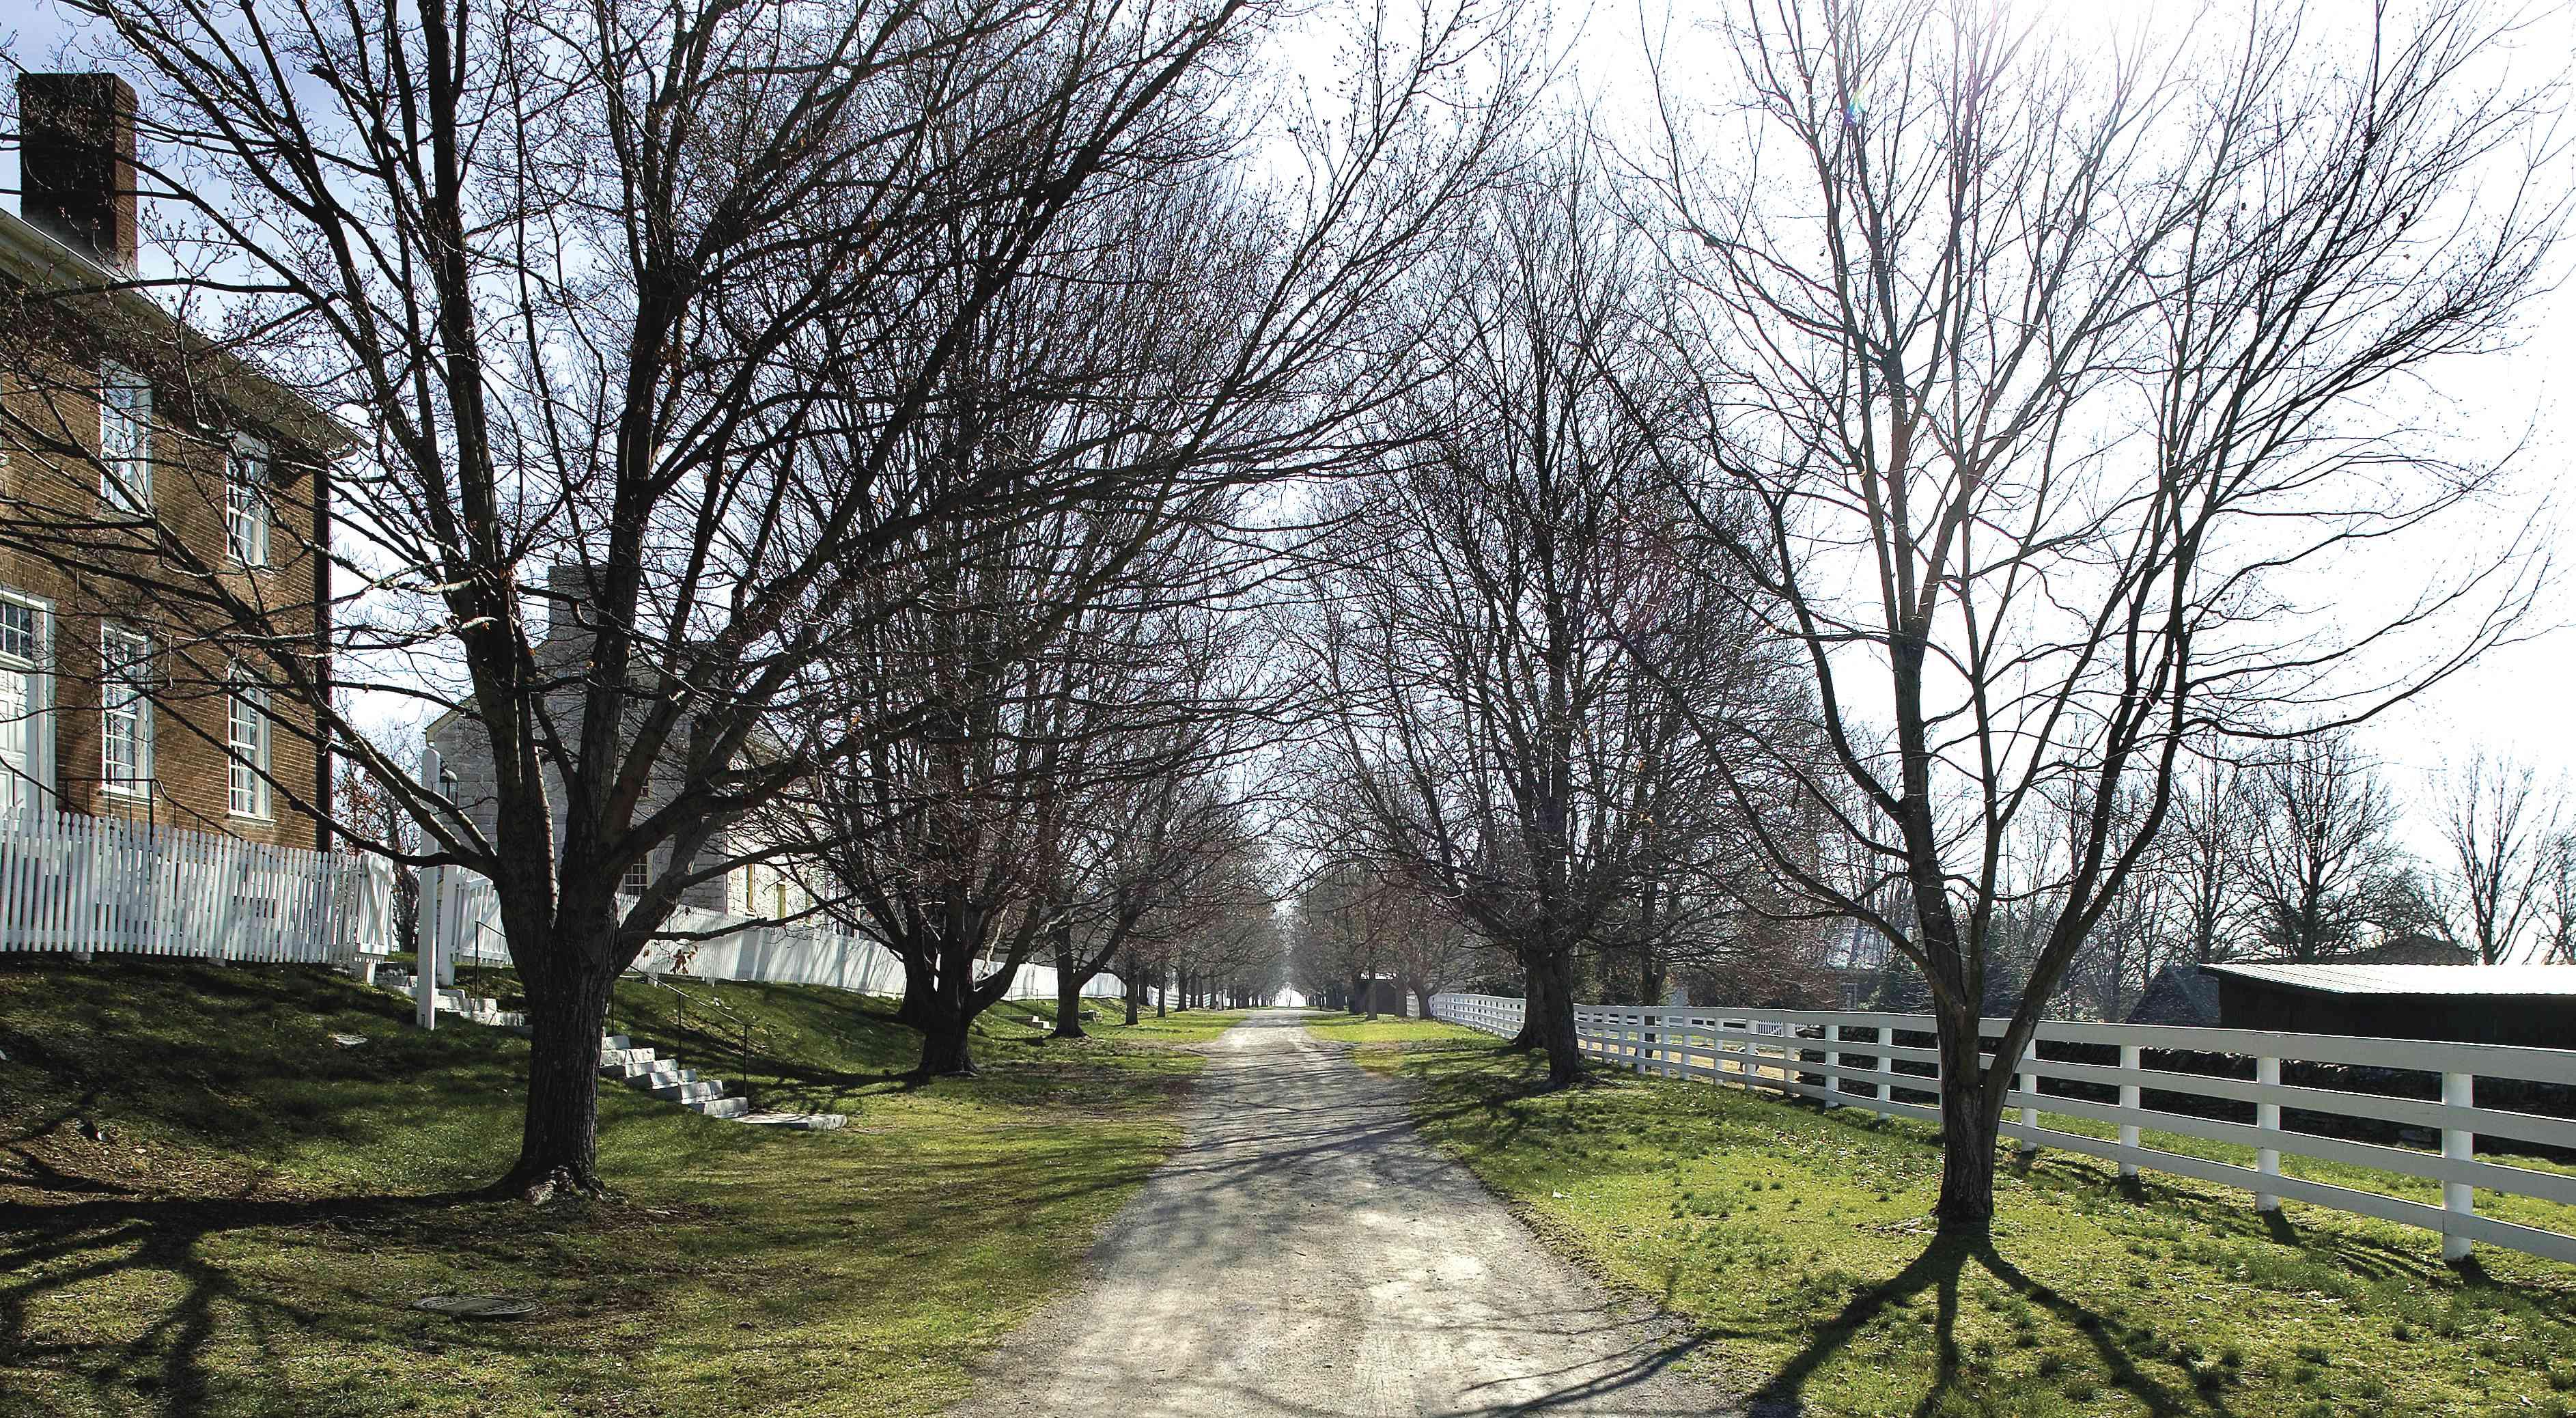 Shaker Village of Pleasant Hill in Kentucky